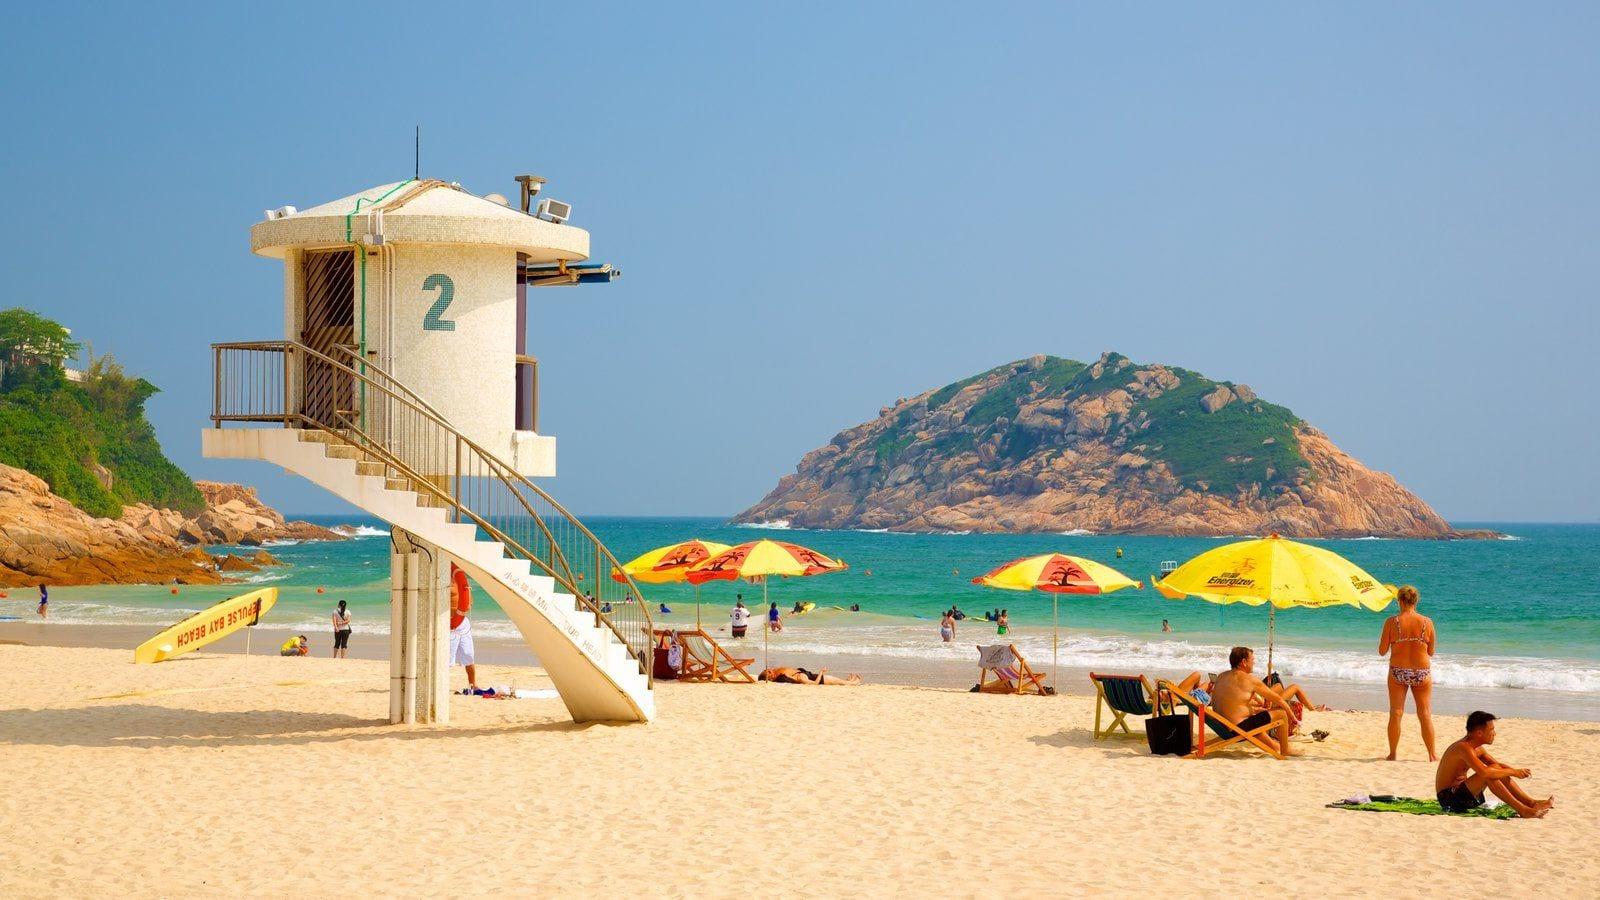 spiaggia hong kong, mare hong kong, hong kong beach